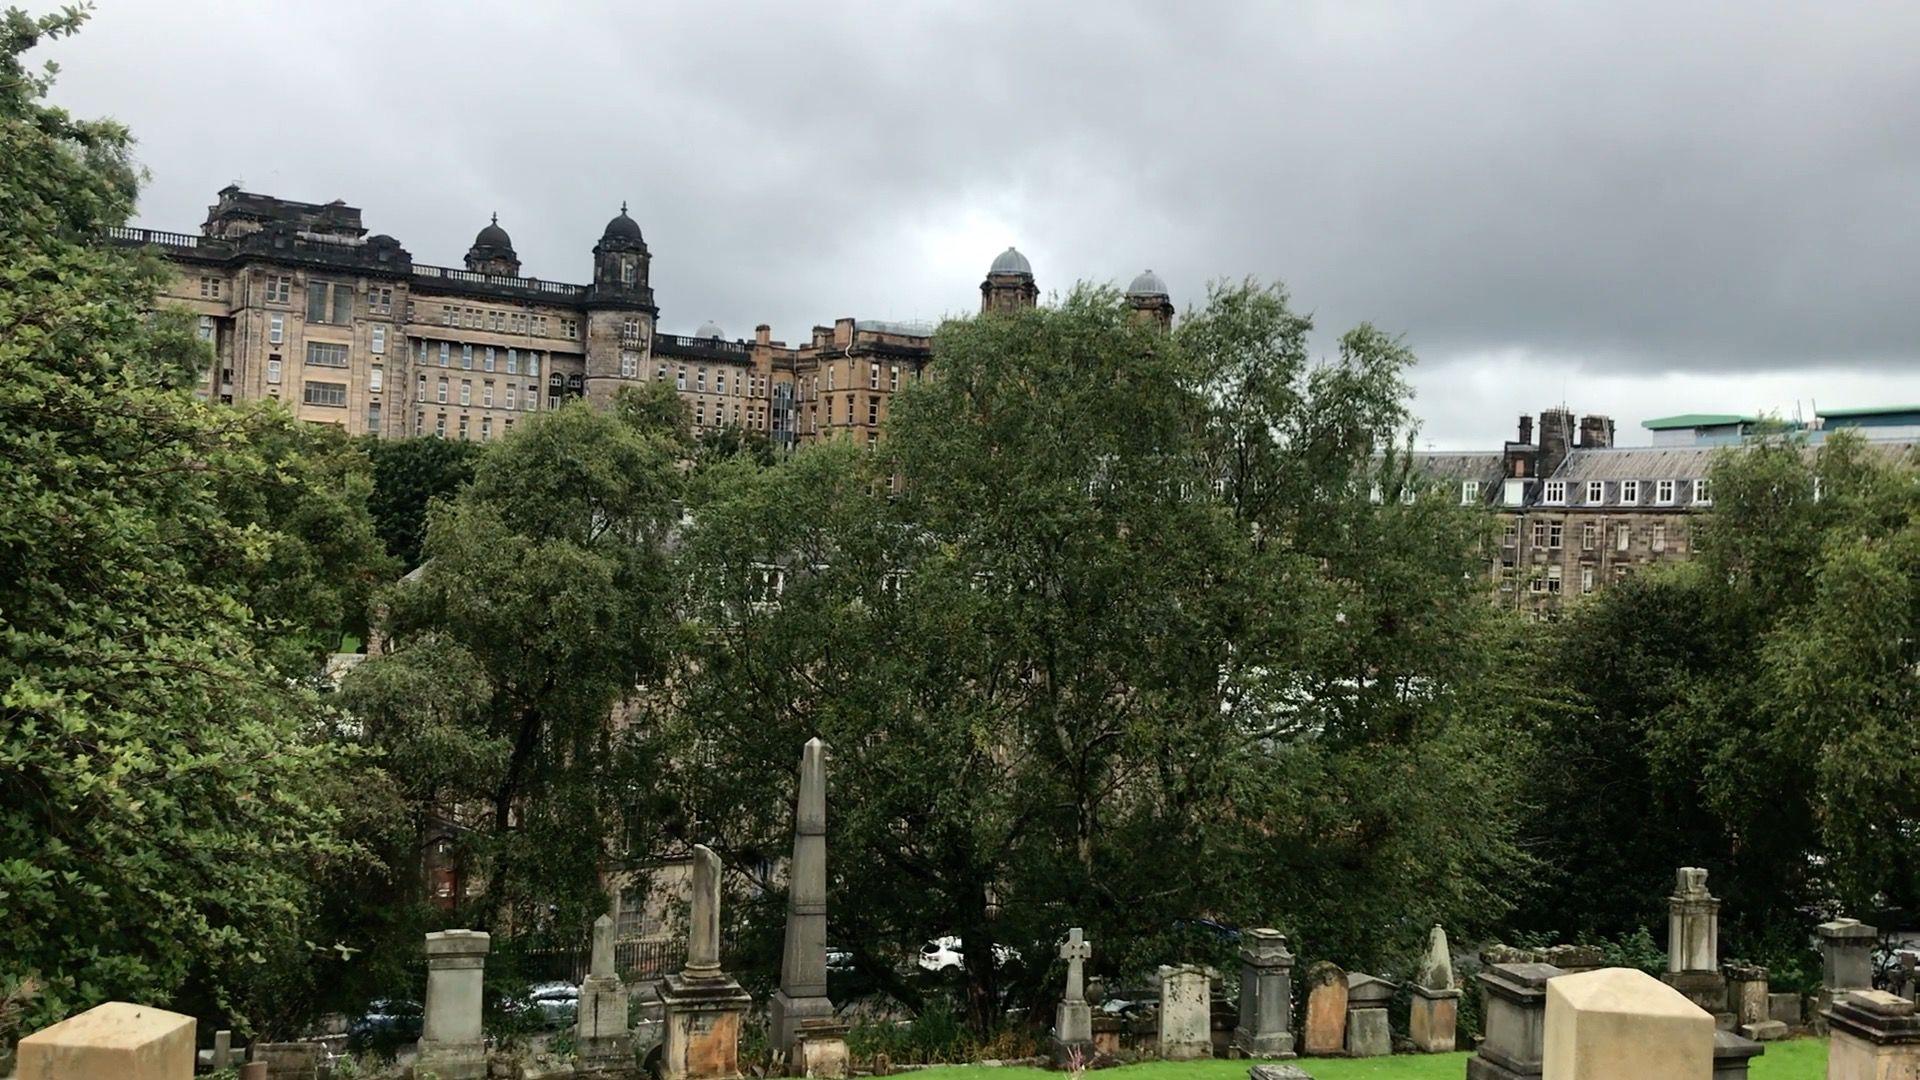 Glasgow - Necropoli